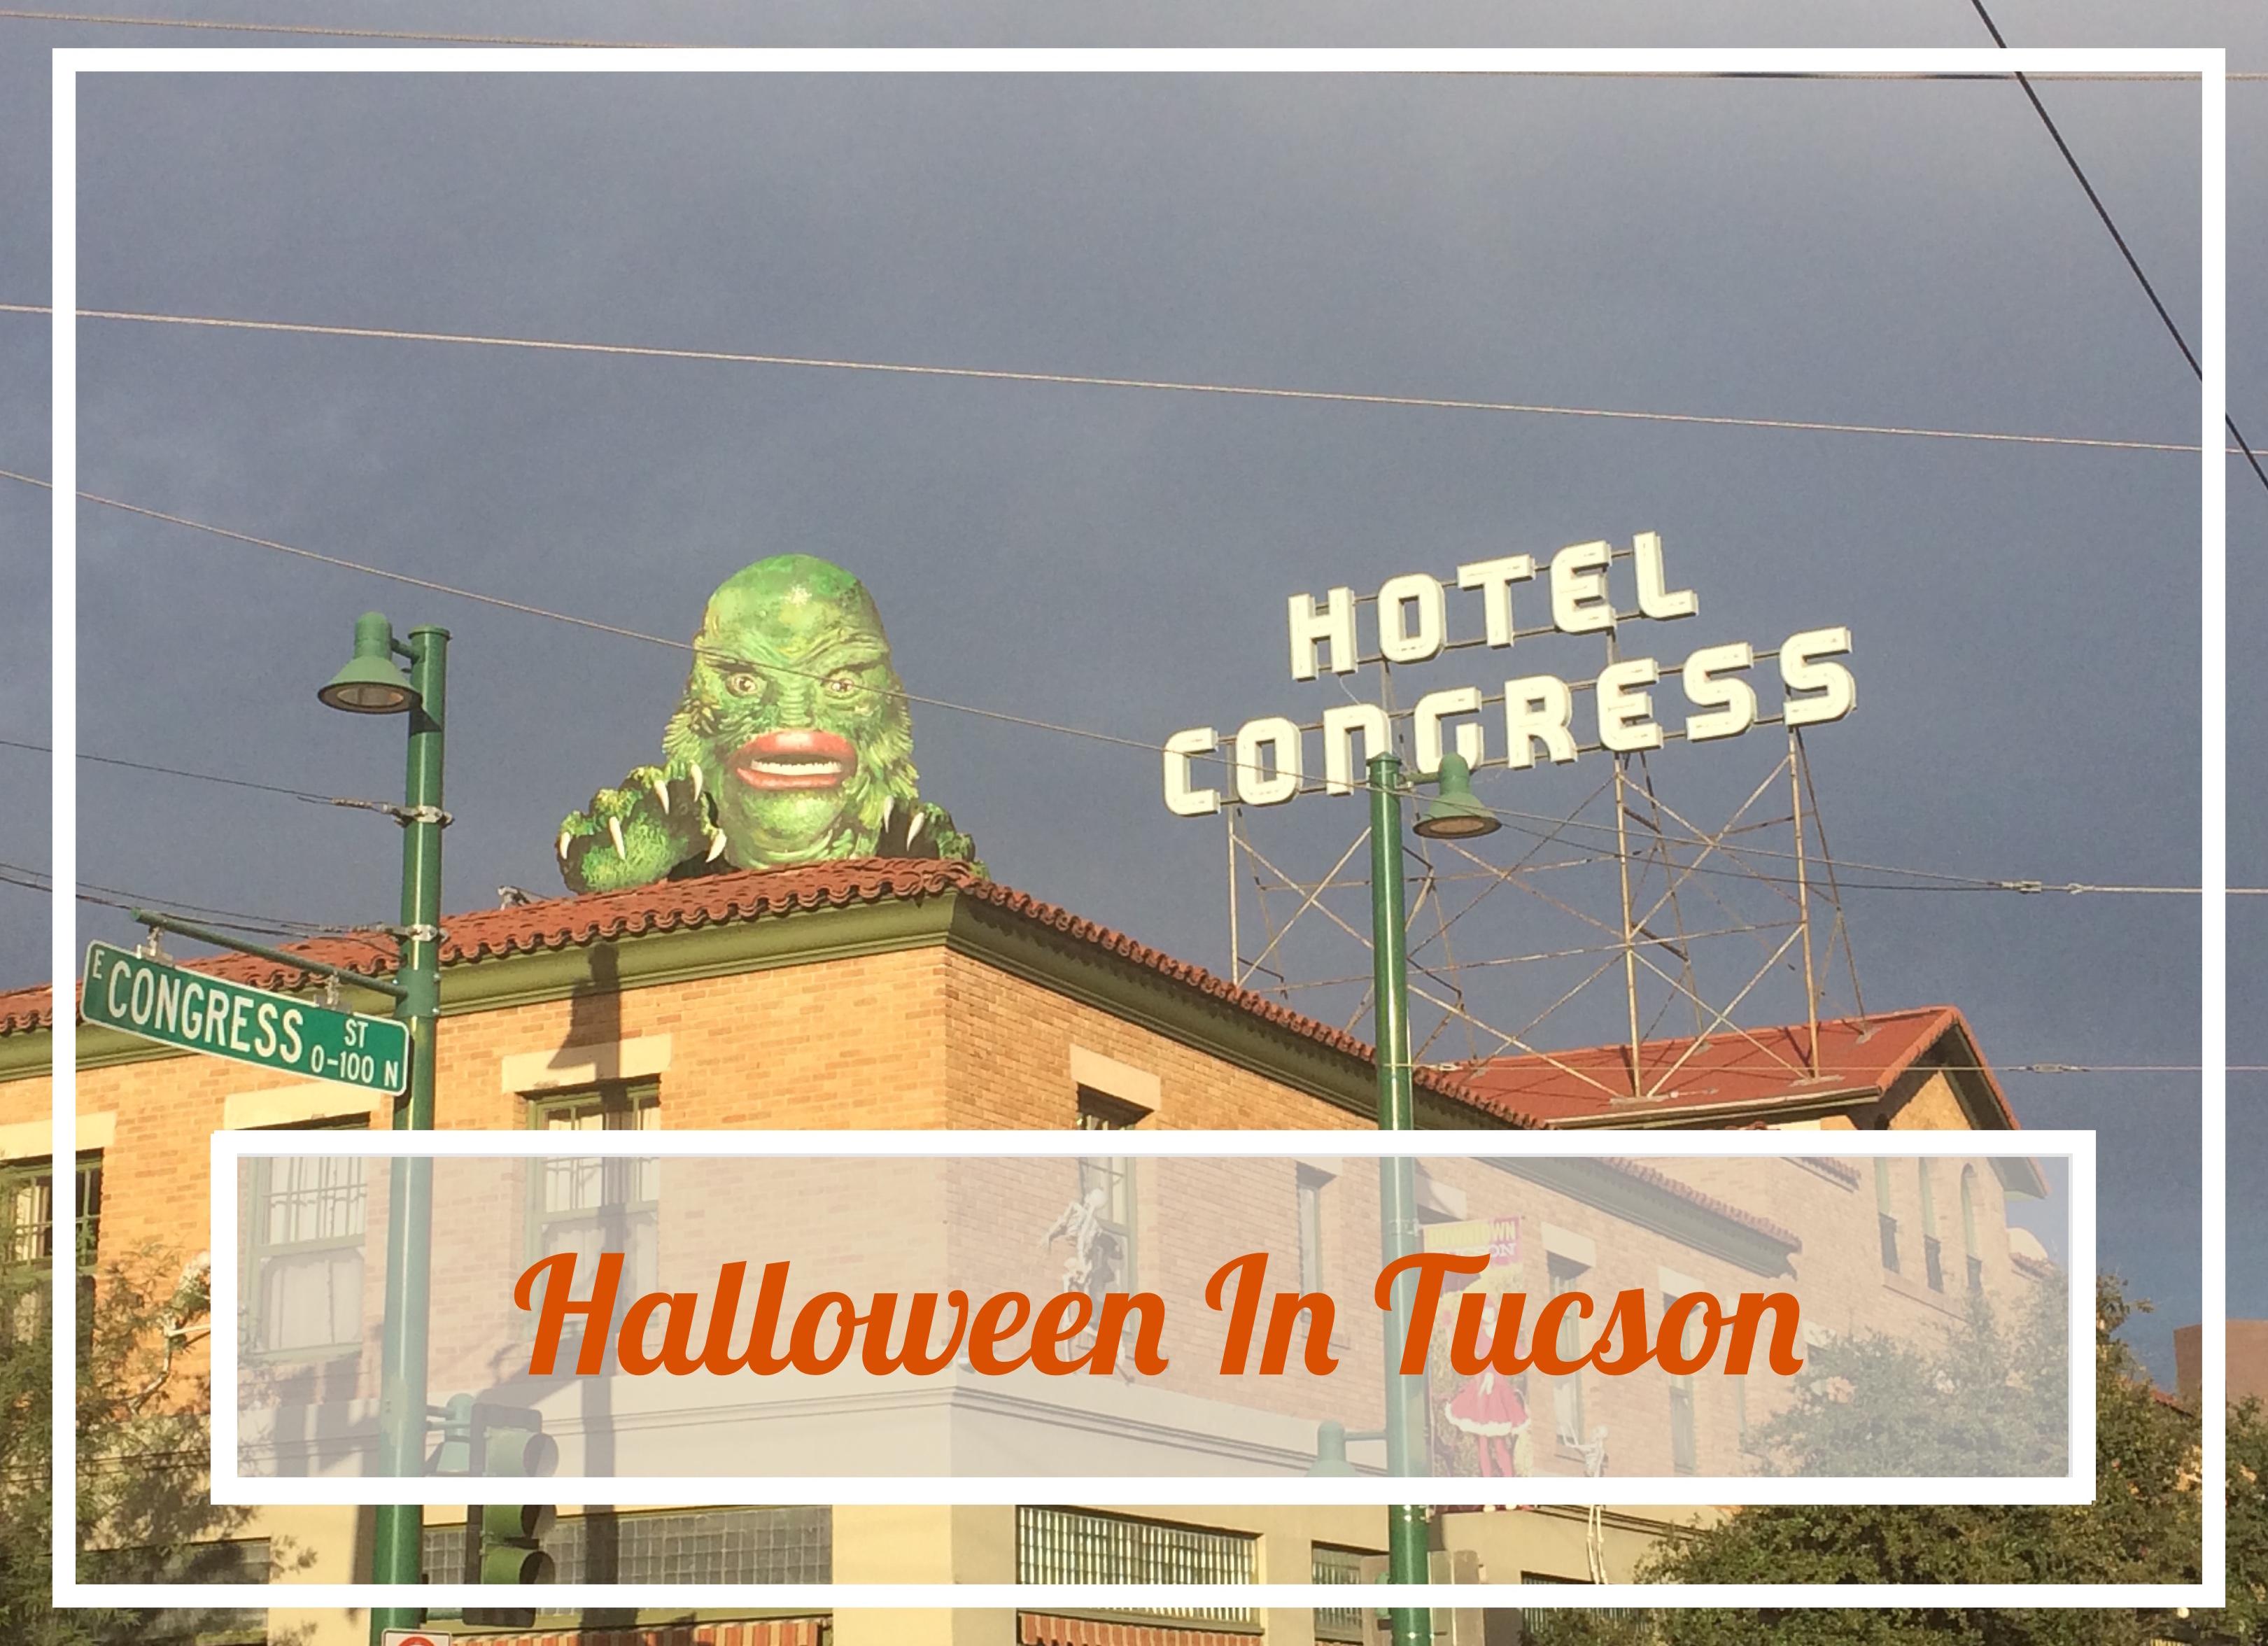 Halloween In Tucson